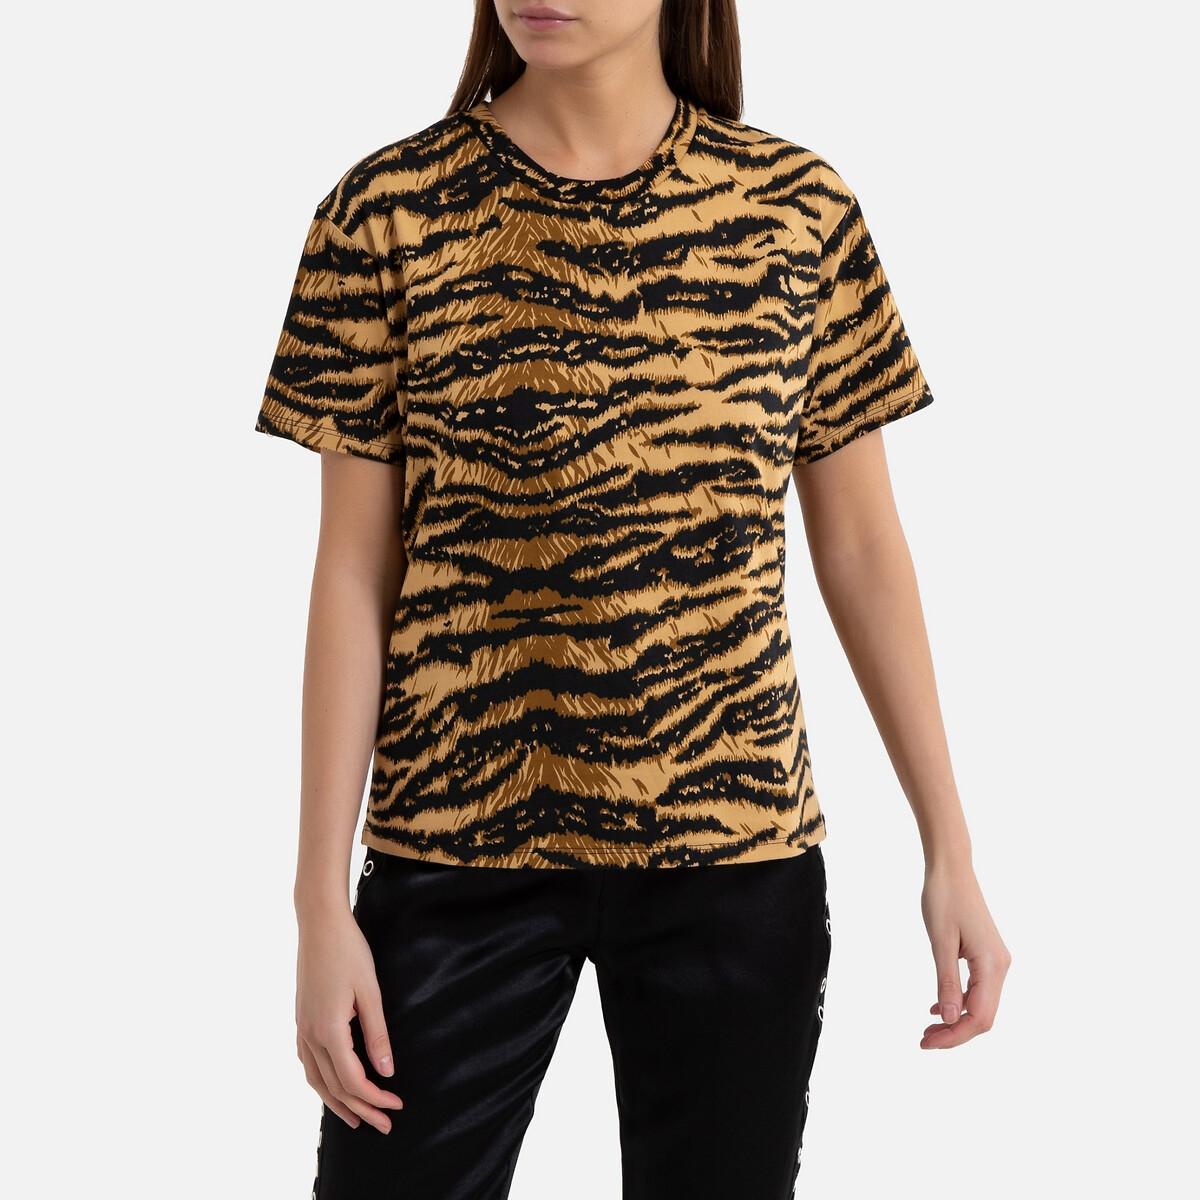 Camiseta animal print con cuello redondo de manga corta